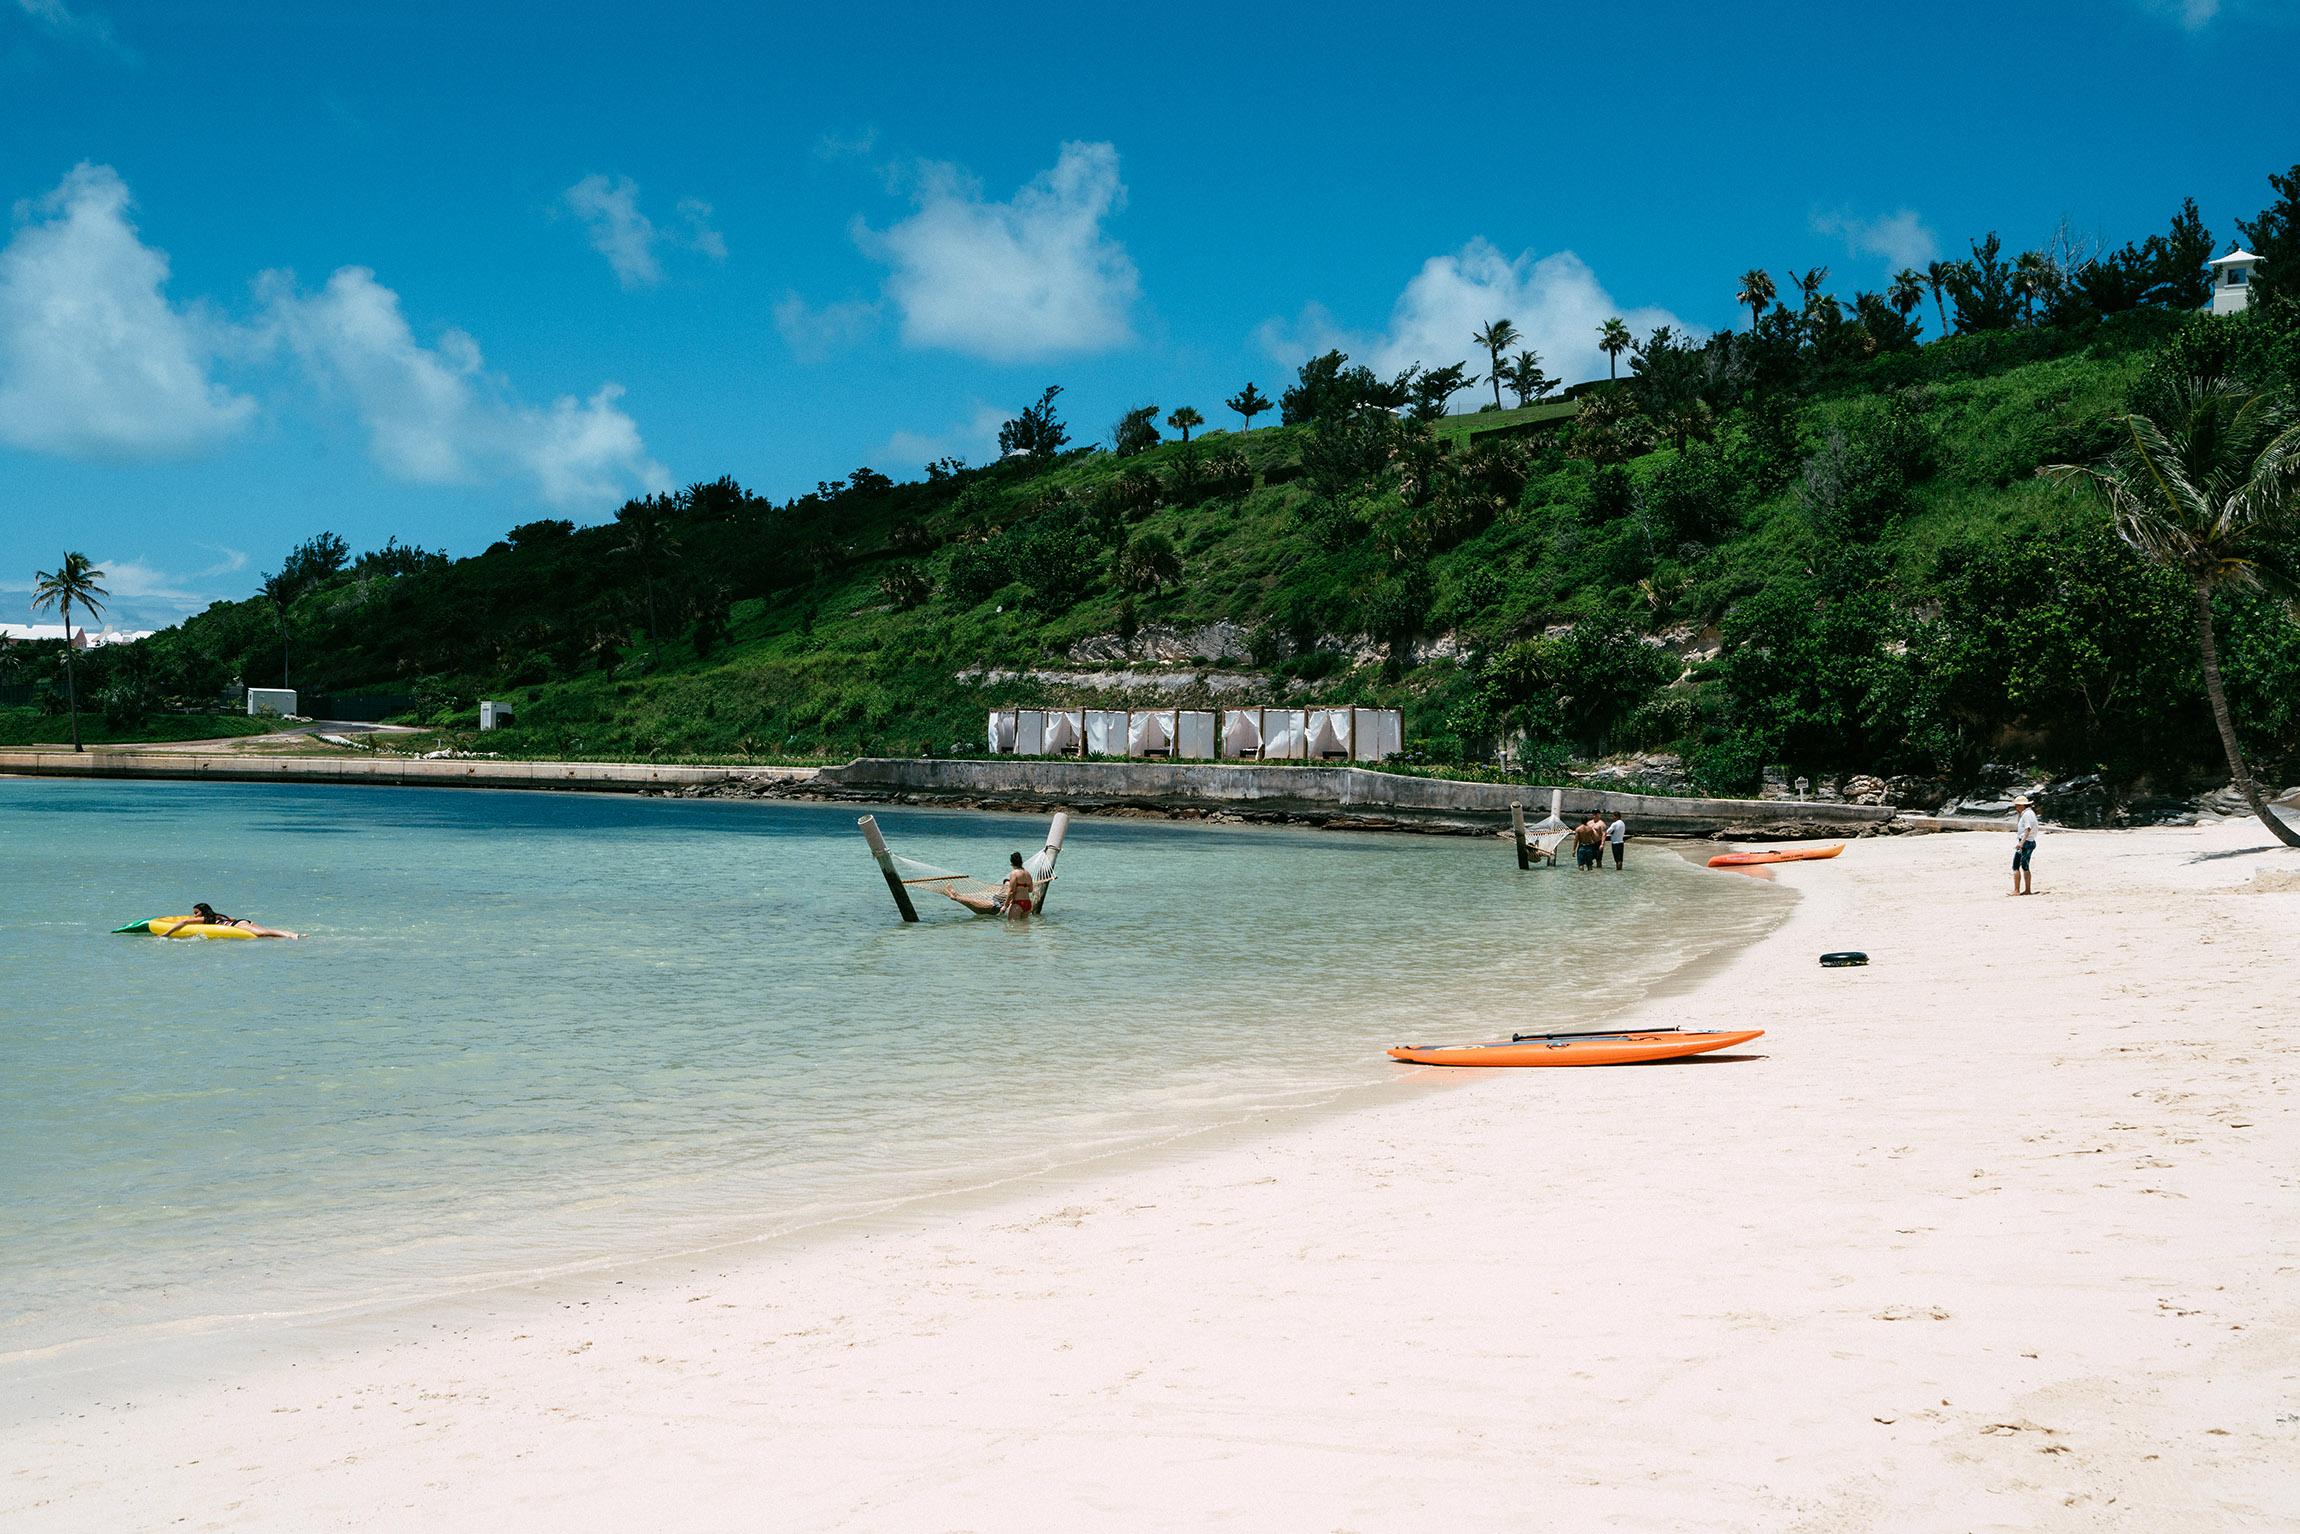 The Hamilton Princess Hotel & Beach Club